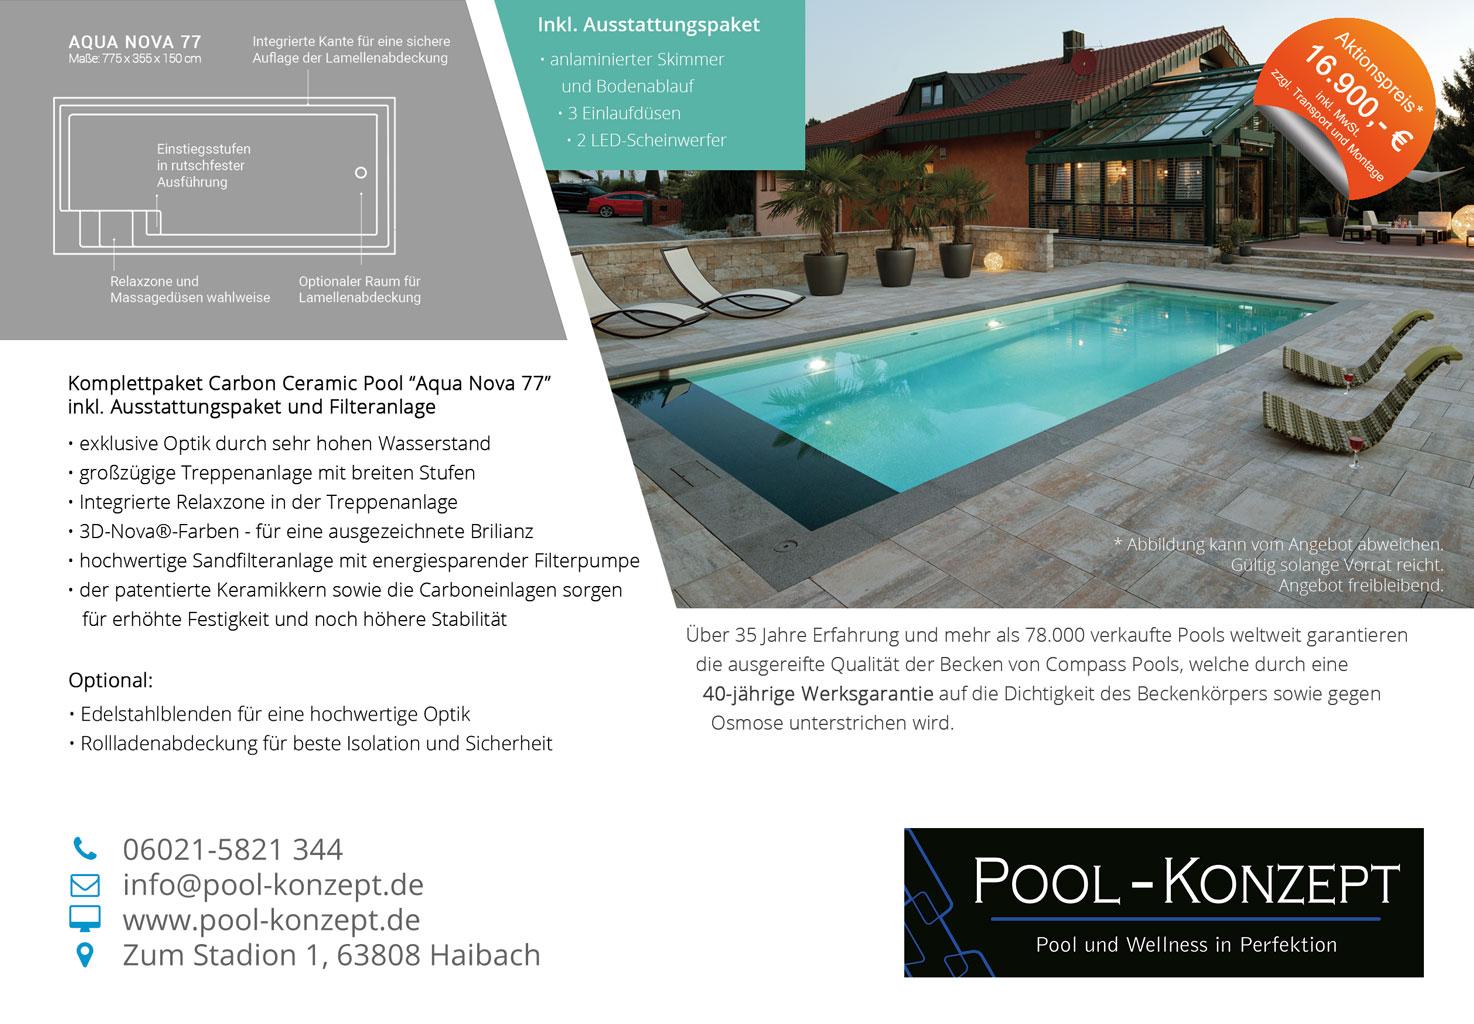 Pool-Konzept – Pool und Wellness in Perfektion